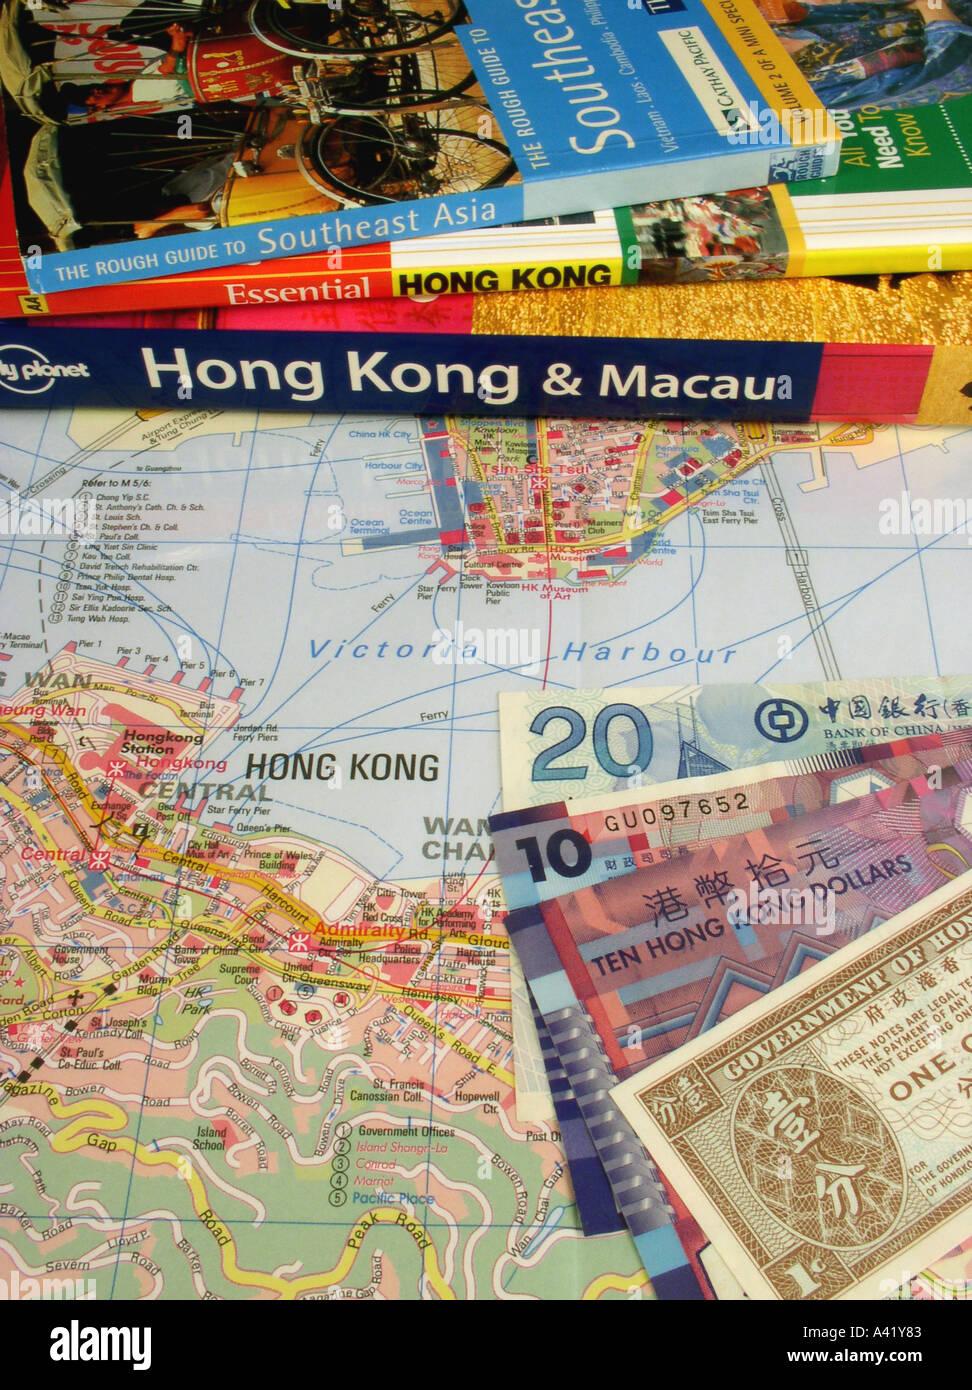 Kowloon Hong Kong Map on singapore map, kowloon city map, kowloon mtr map, mongkok map, tsim sha tsui map, kowloon china, santo domingo dominican republic map, harbour grand kowloon map, hk map, kowloon street map in chinese, nathan road kowloon map, kowloon bus route map, shenzhen map, macau map, kowloon map of attractions, china map, hangzhou map, shanghai map,